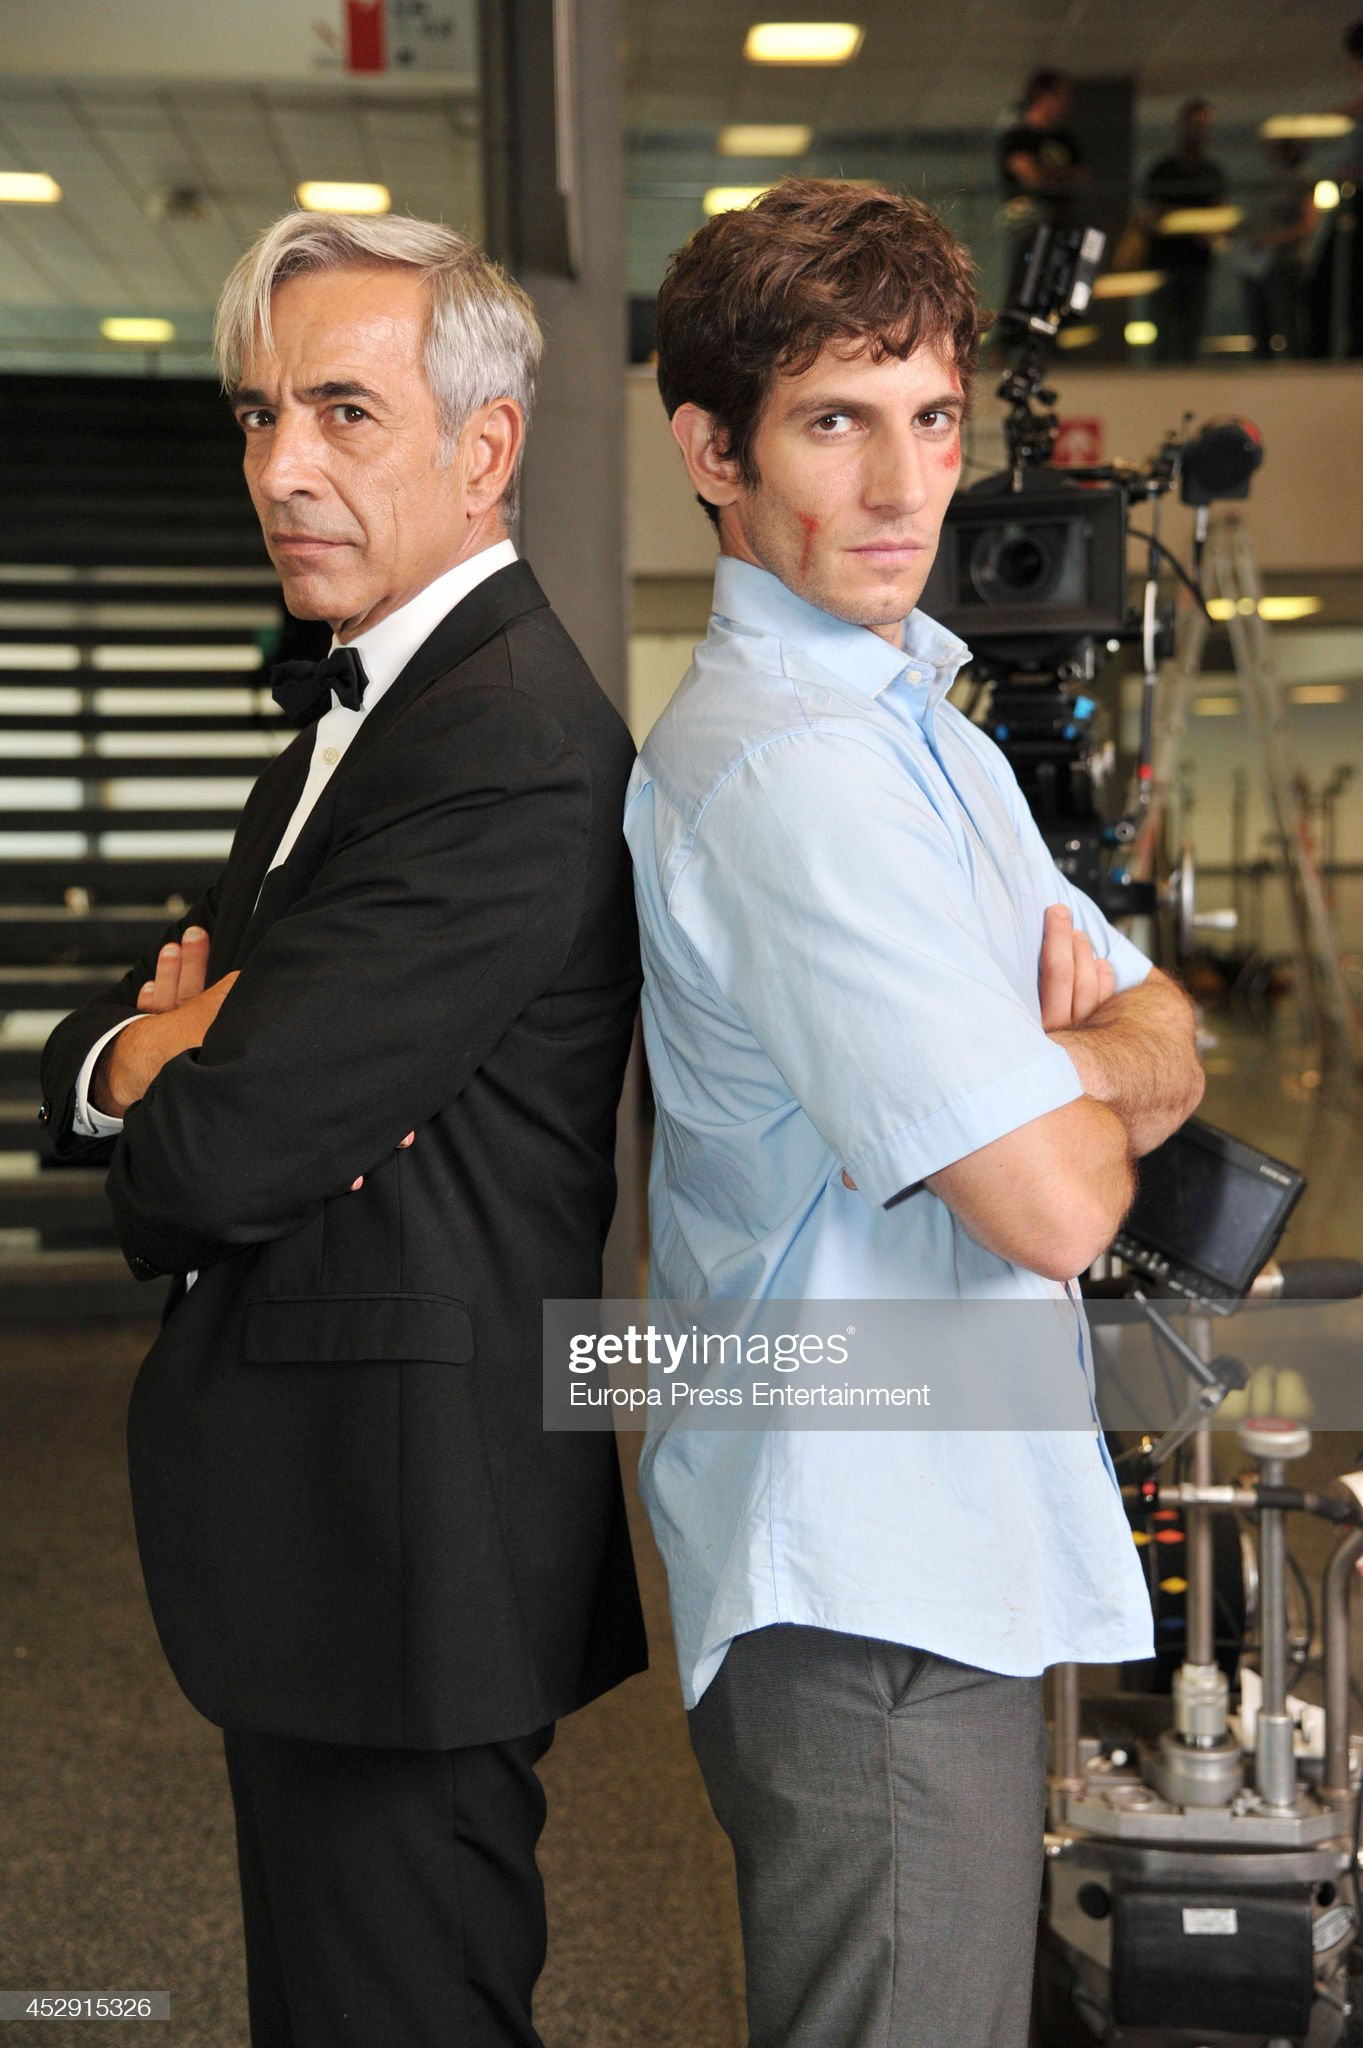 ¿Cuánto mide Quim Gutiérrez? - Altura Imanol-arias-and-quim-gutierrez-pose-on-the-set-of-their-latest-movie-picture-id452915326?s=2048x2048